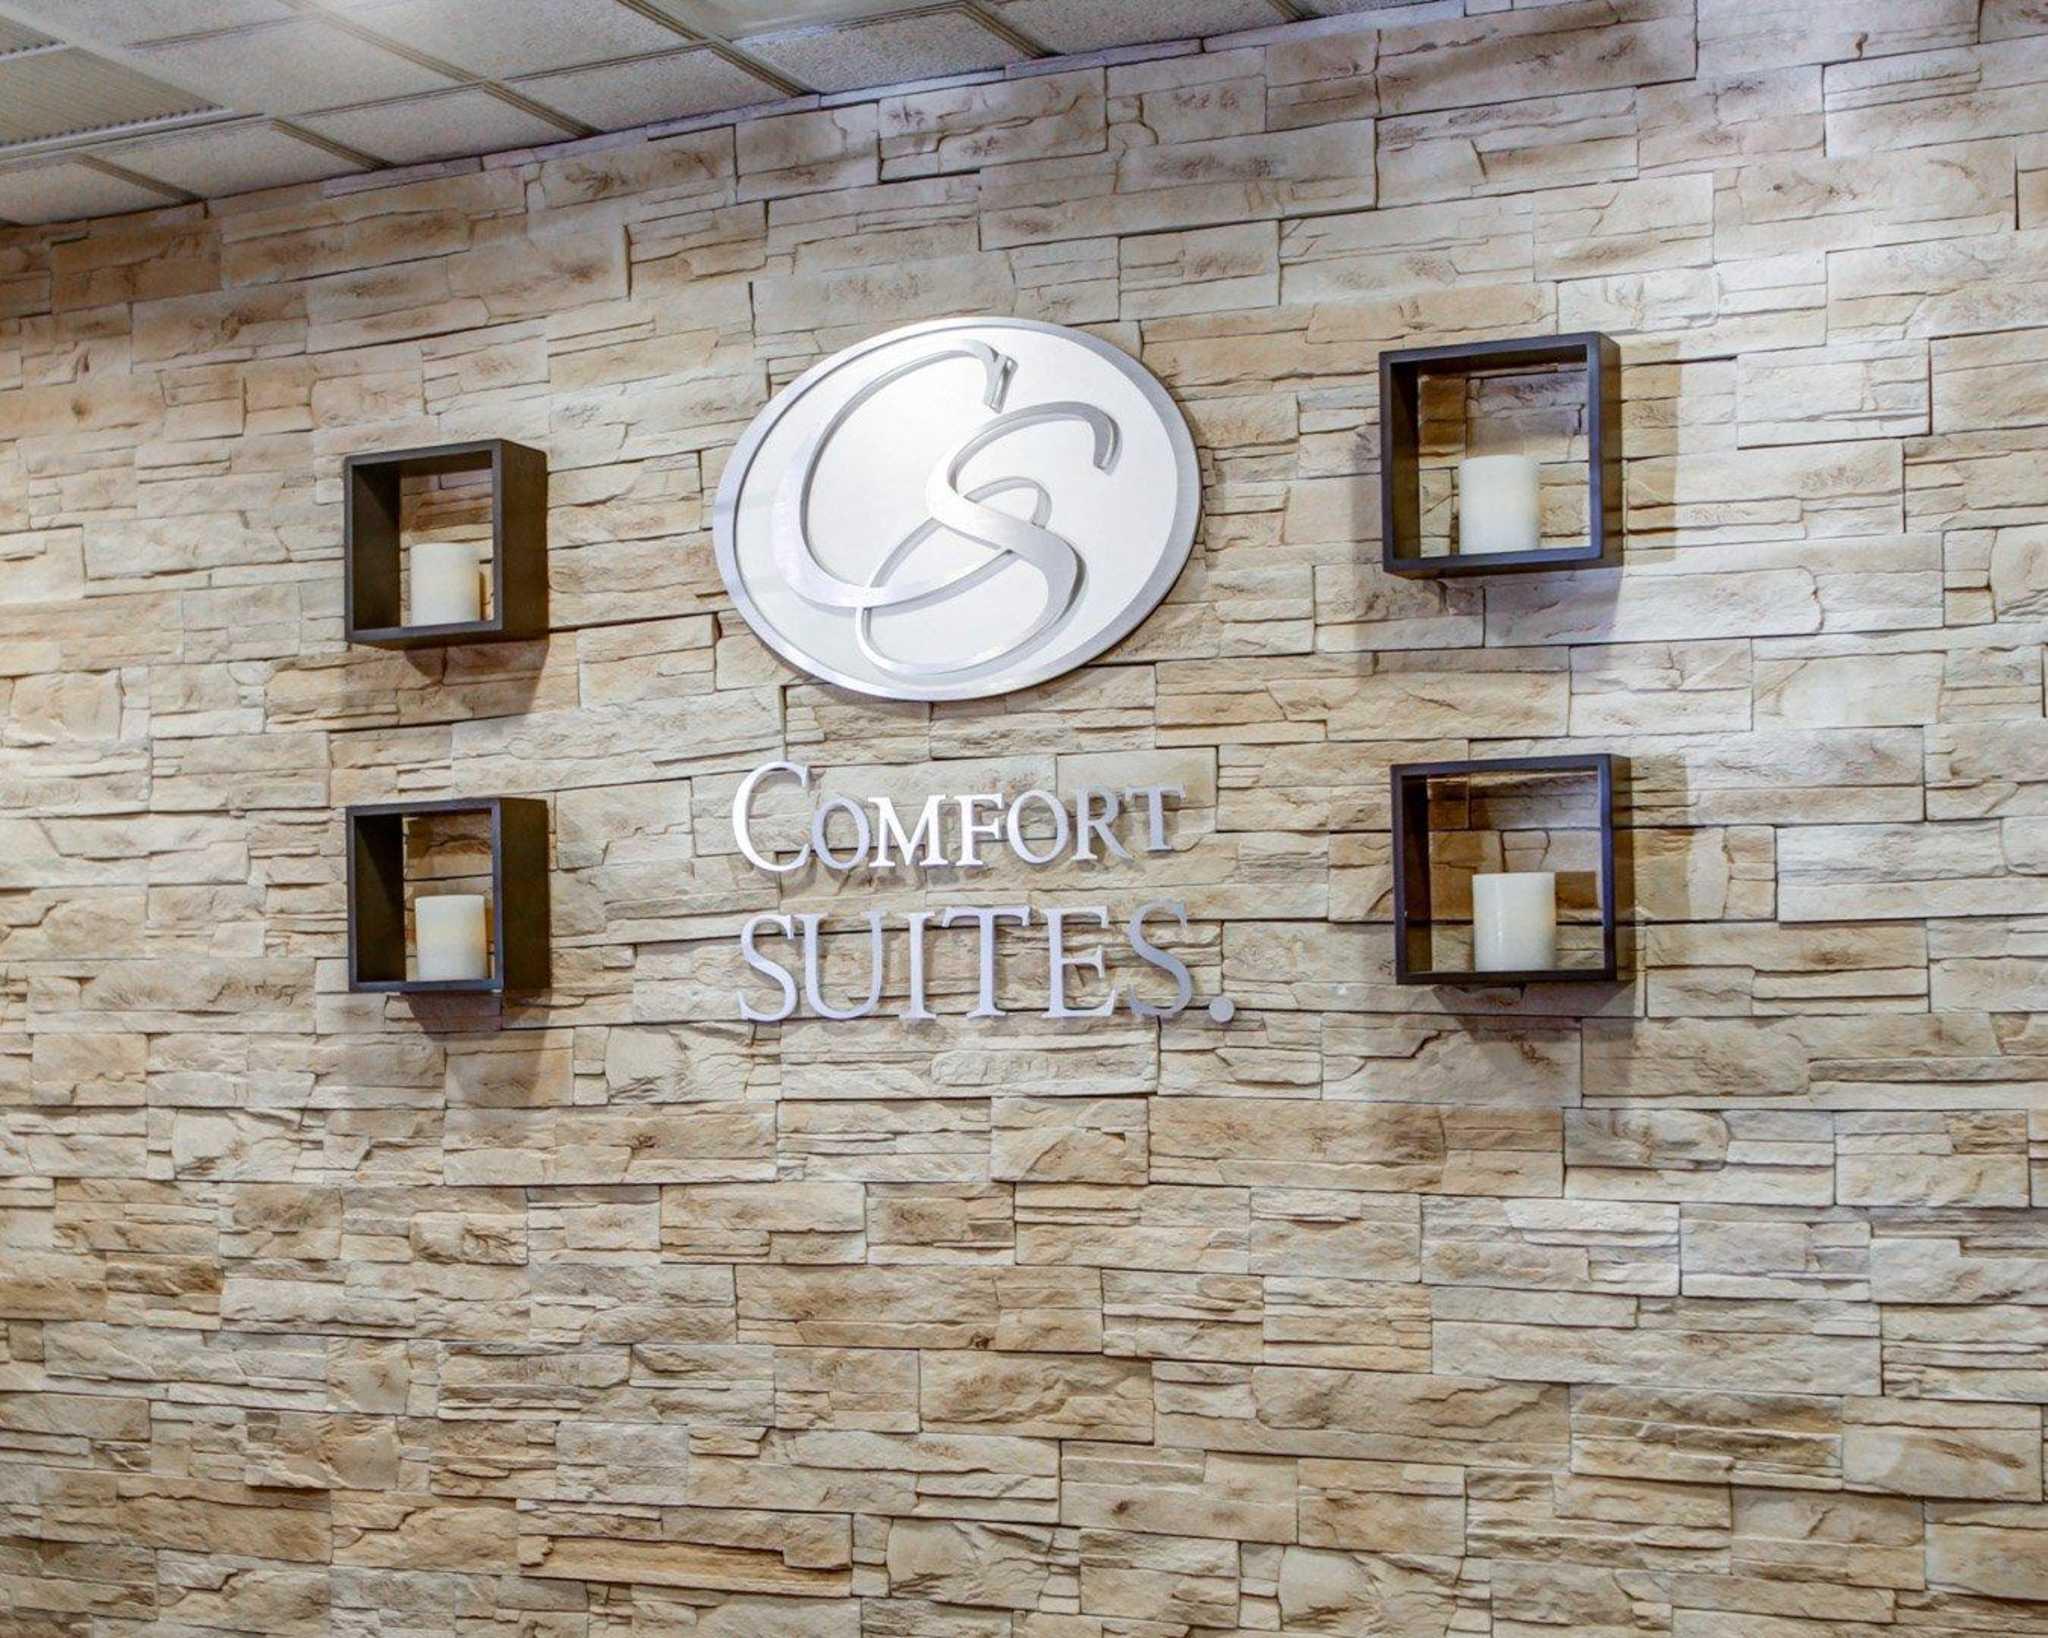 Comfort Suites Weston - Sawgrass Mills South image 8